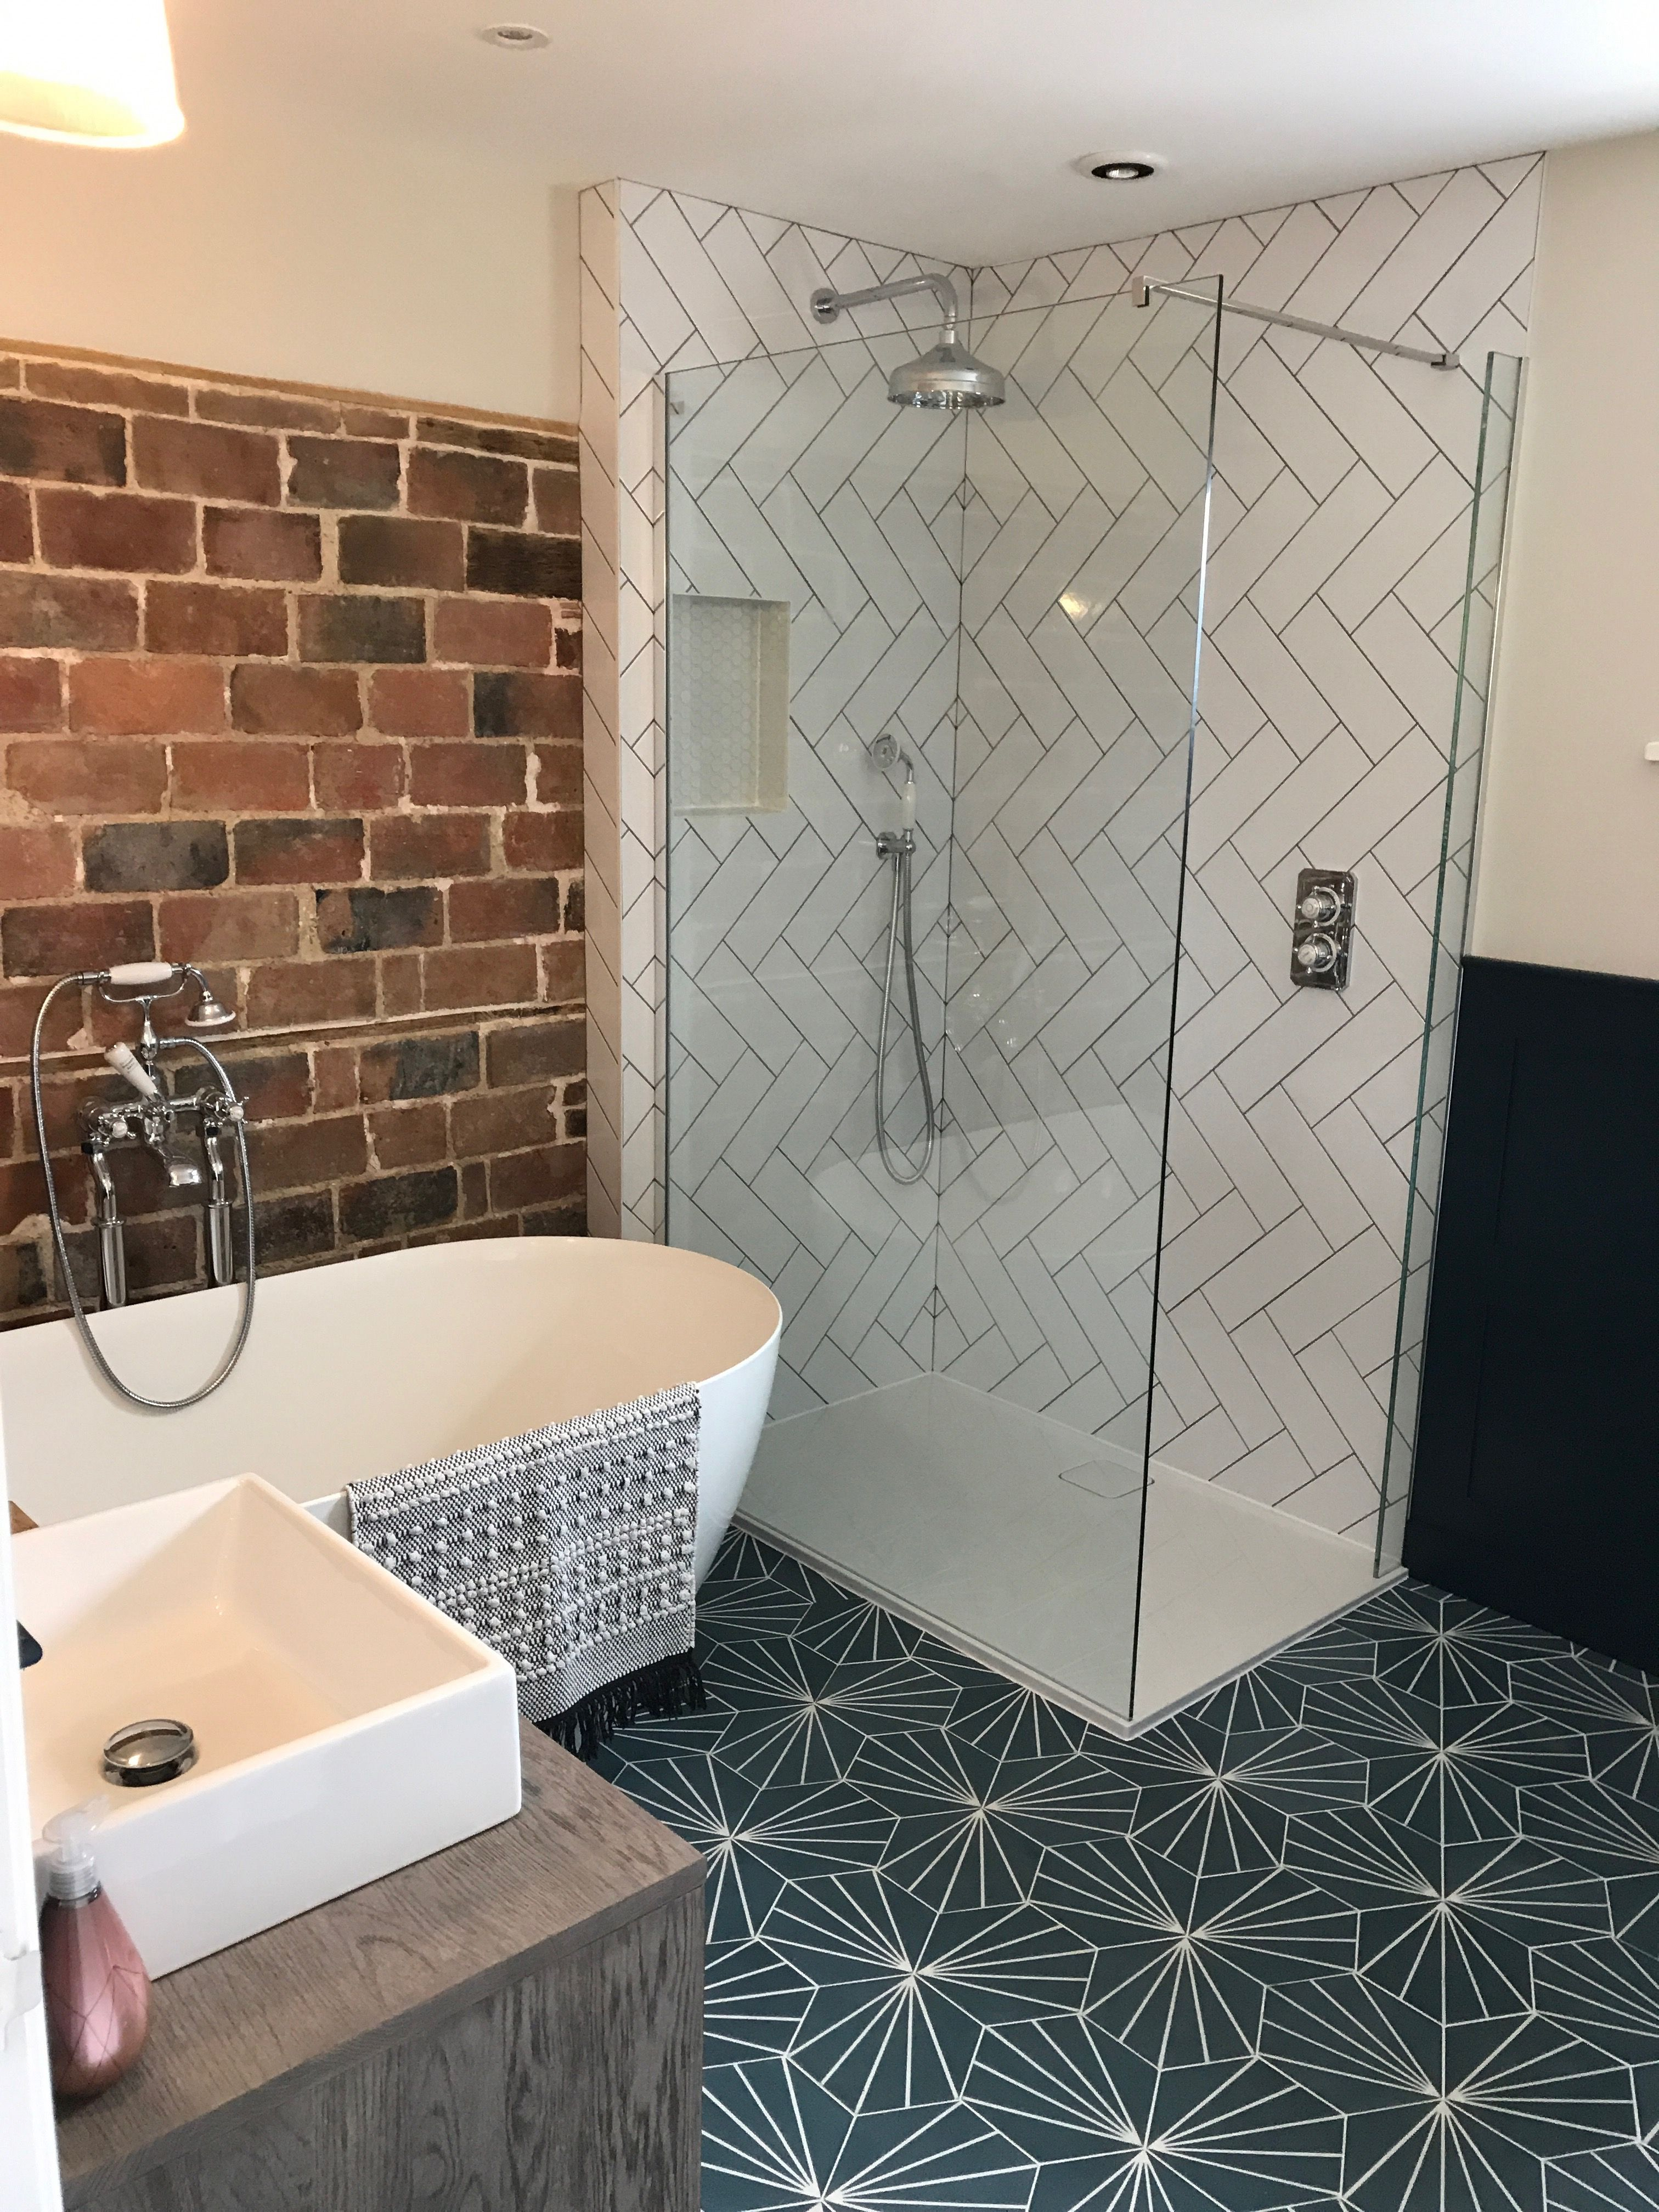 Bathroom Renovation Herringbone Tile Exposed Brick Feature Wall Moroccan Hex Floor Tiles Brick Bathroom Bathroom Inspiration Herringbone Tile Bathroom